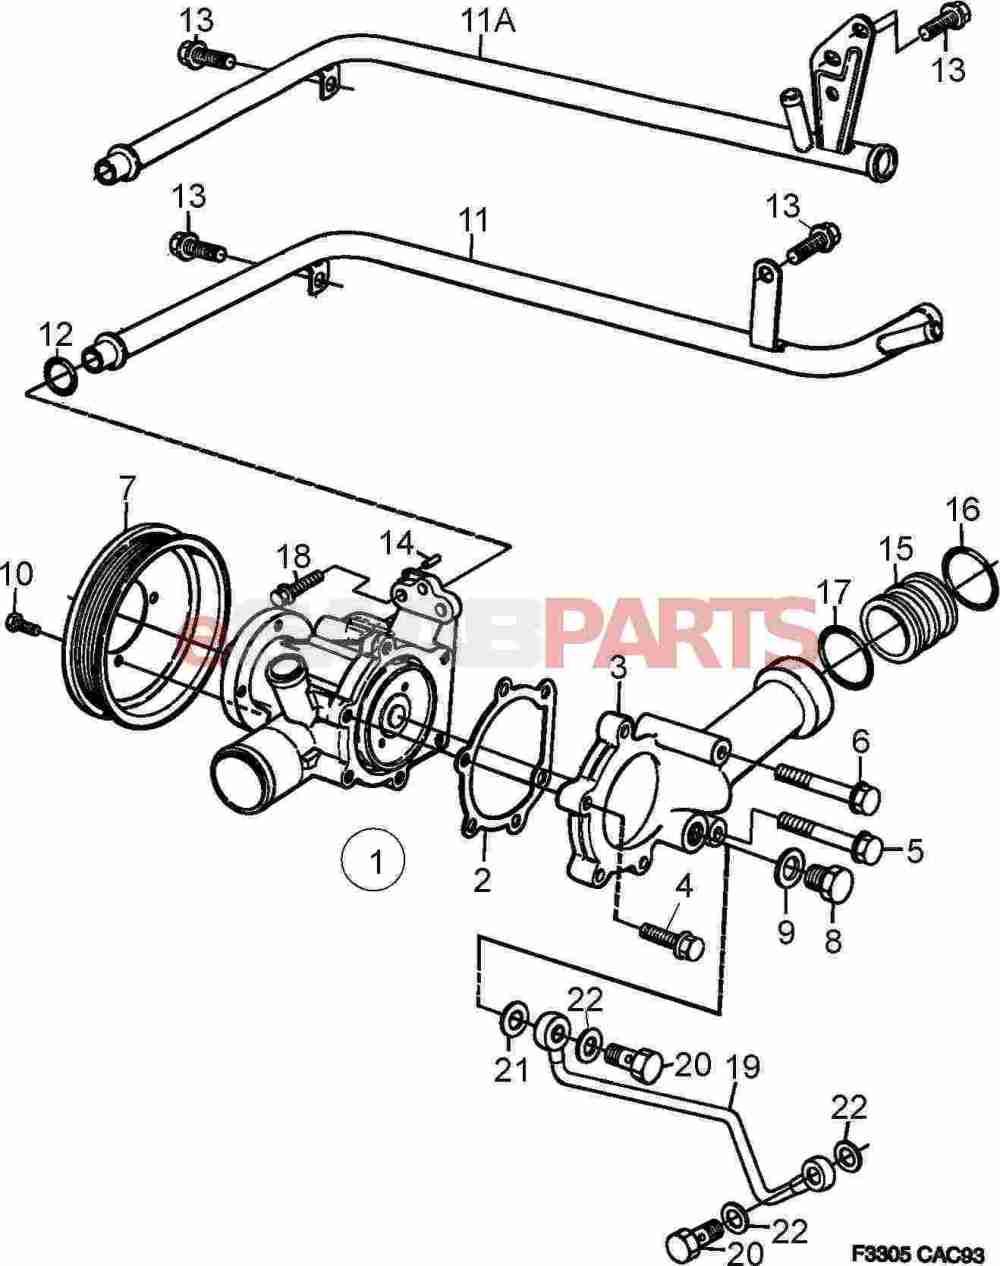 medium resolution of 92150435 saab gasket genuine saab parts from esaabparts com cadillac cooling system diagram saab cooling system diagram